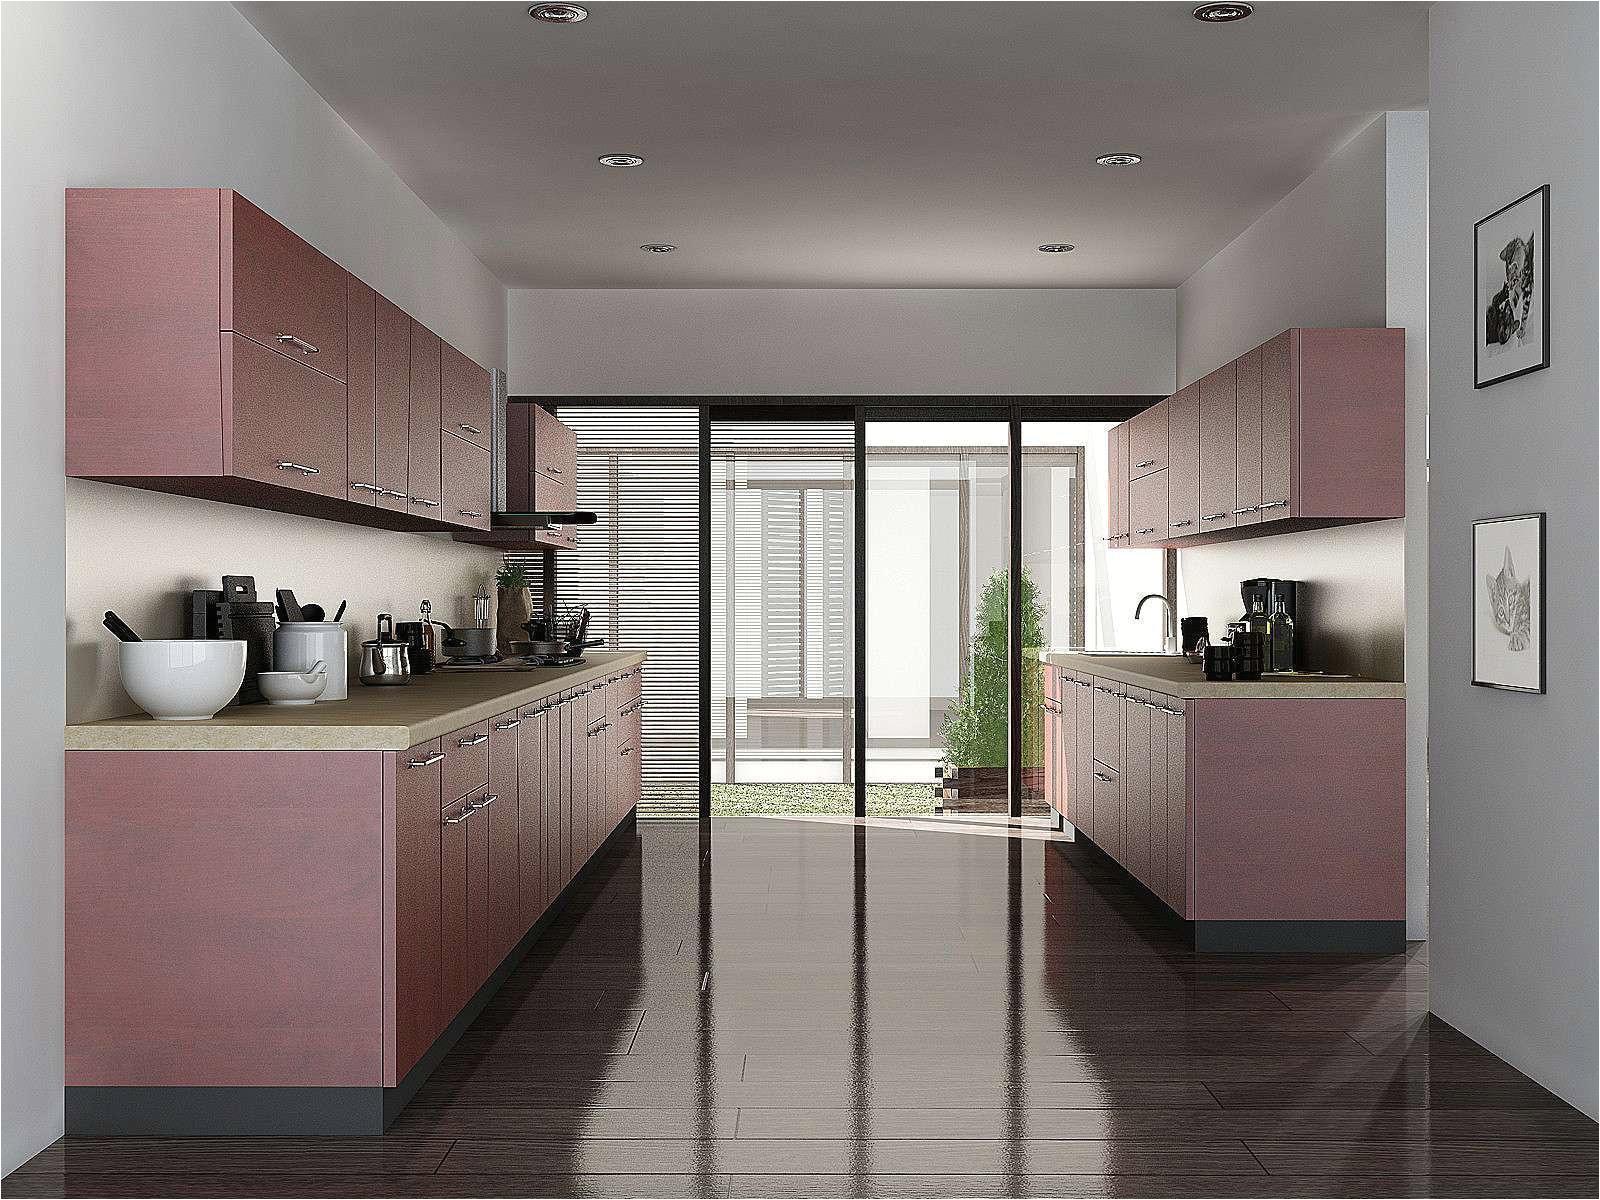 small home interior design inspirational small kitchen layout ideas best home interior design ideas od mi